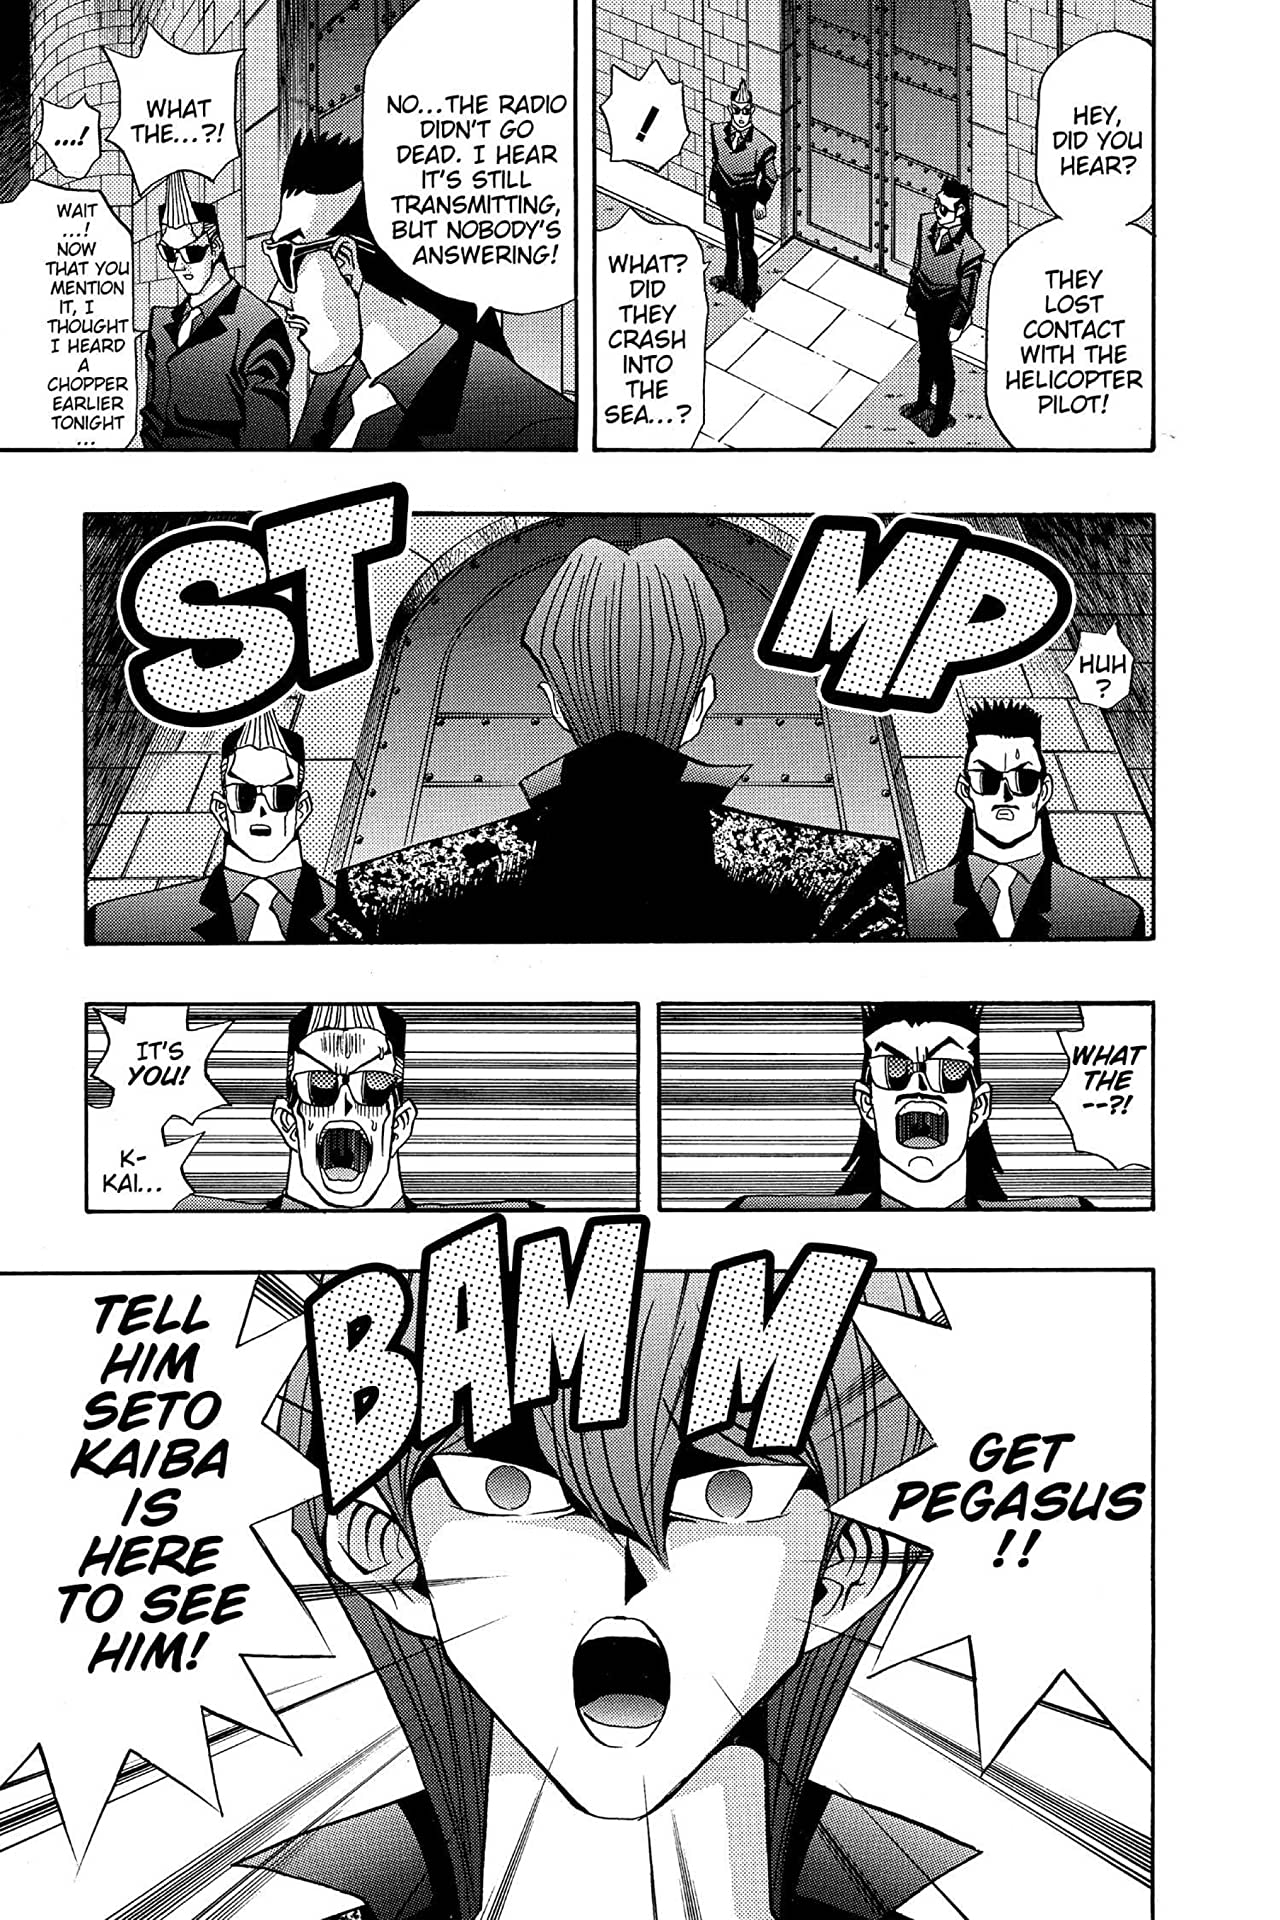 Yu-Gi-Oh!: Duelist Vol. 4